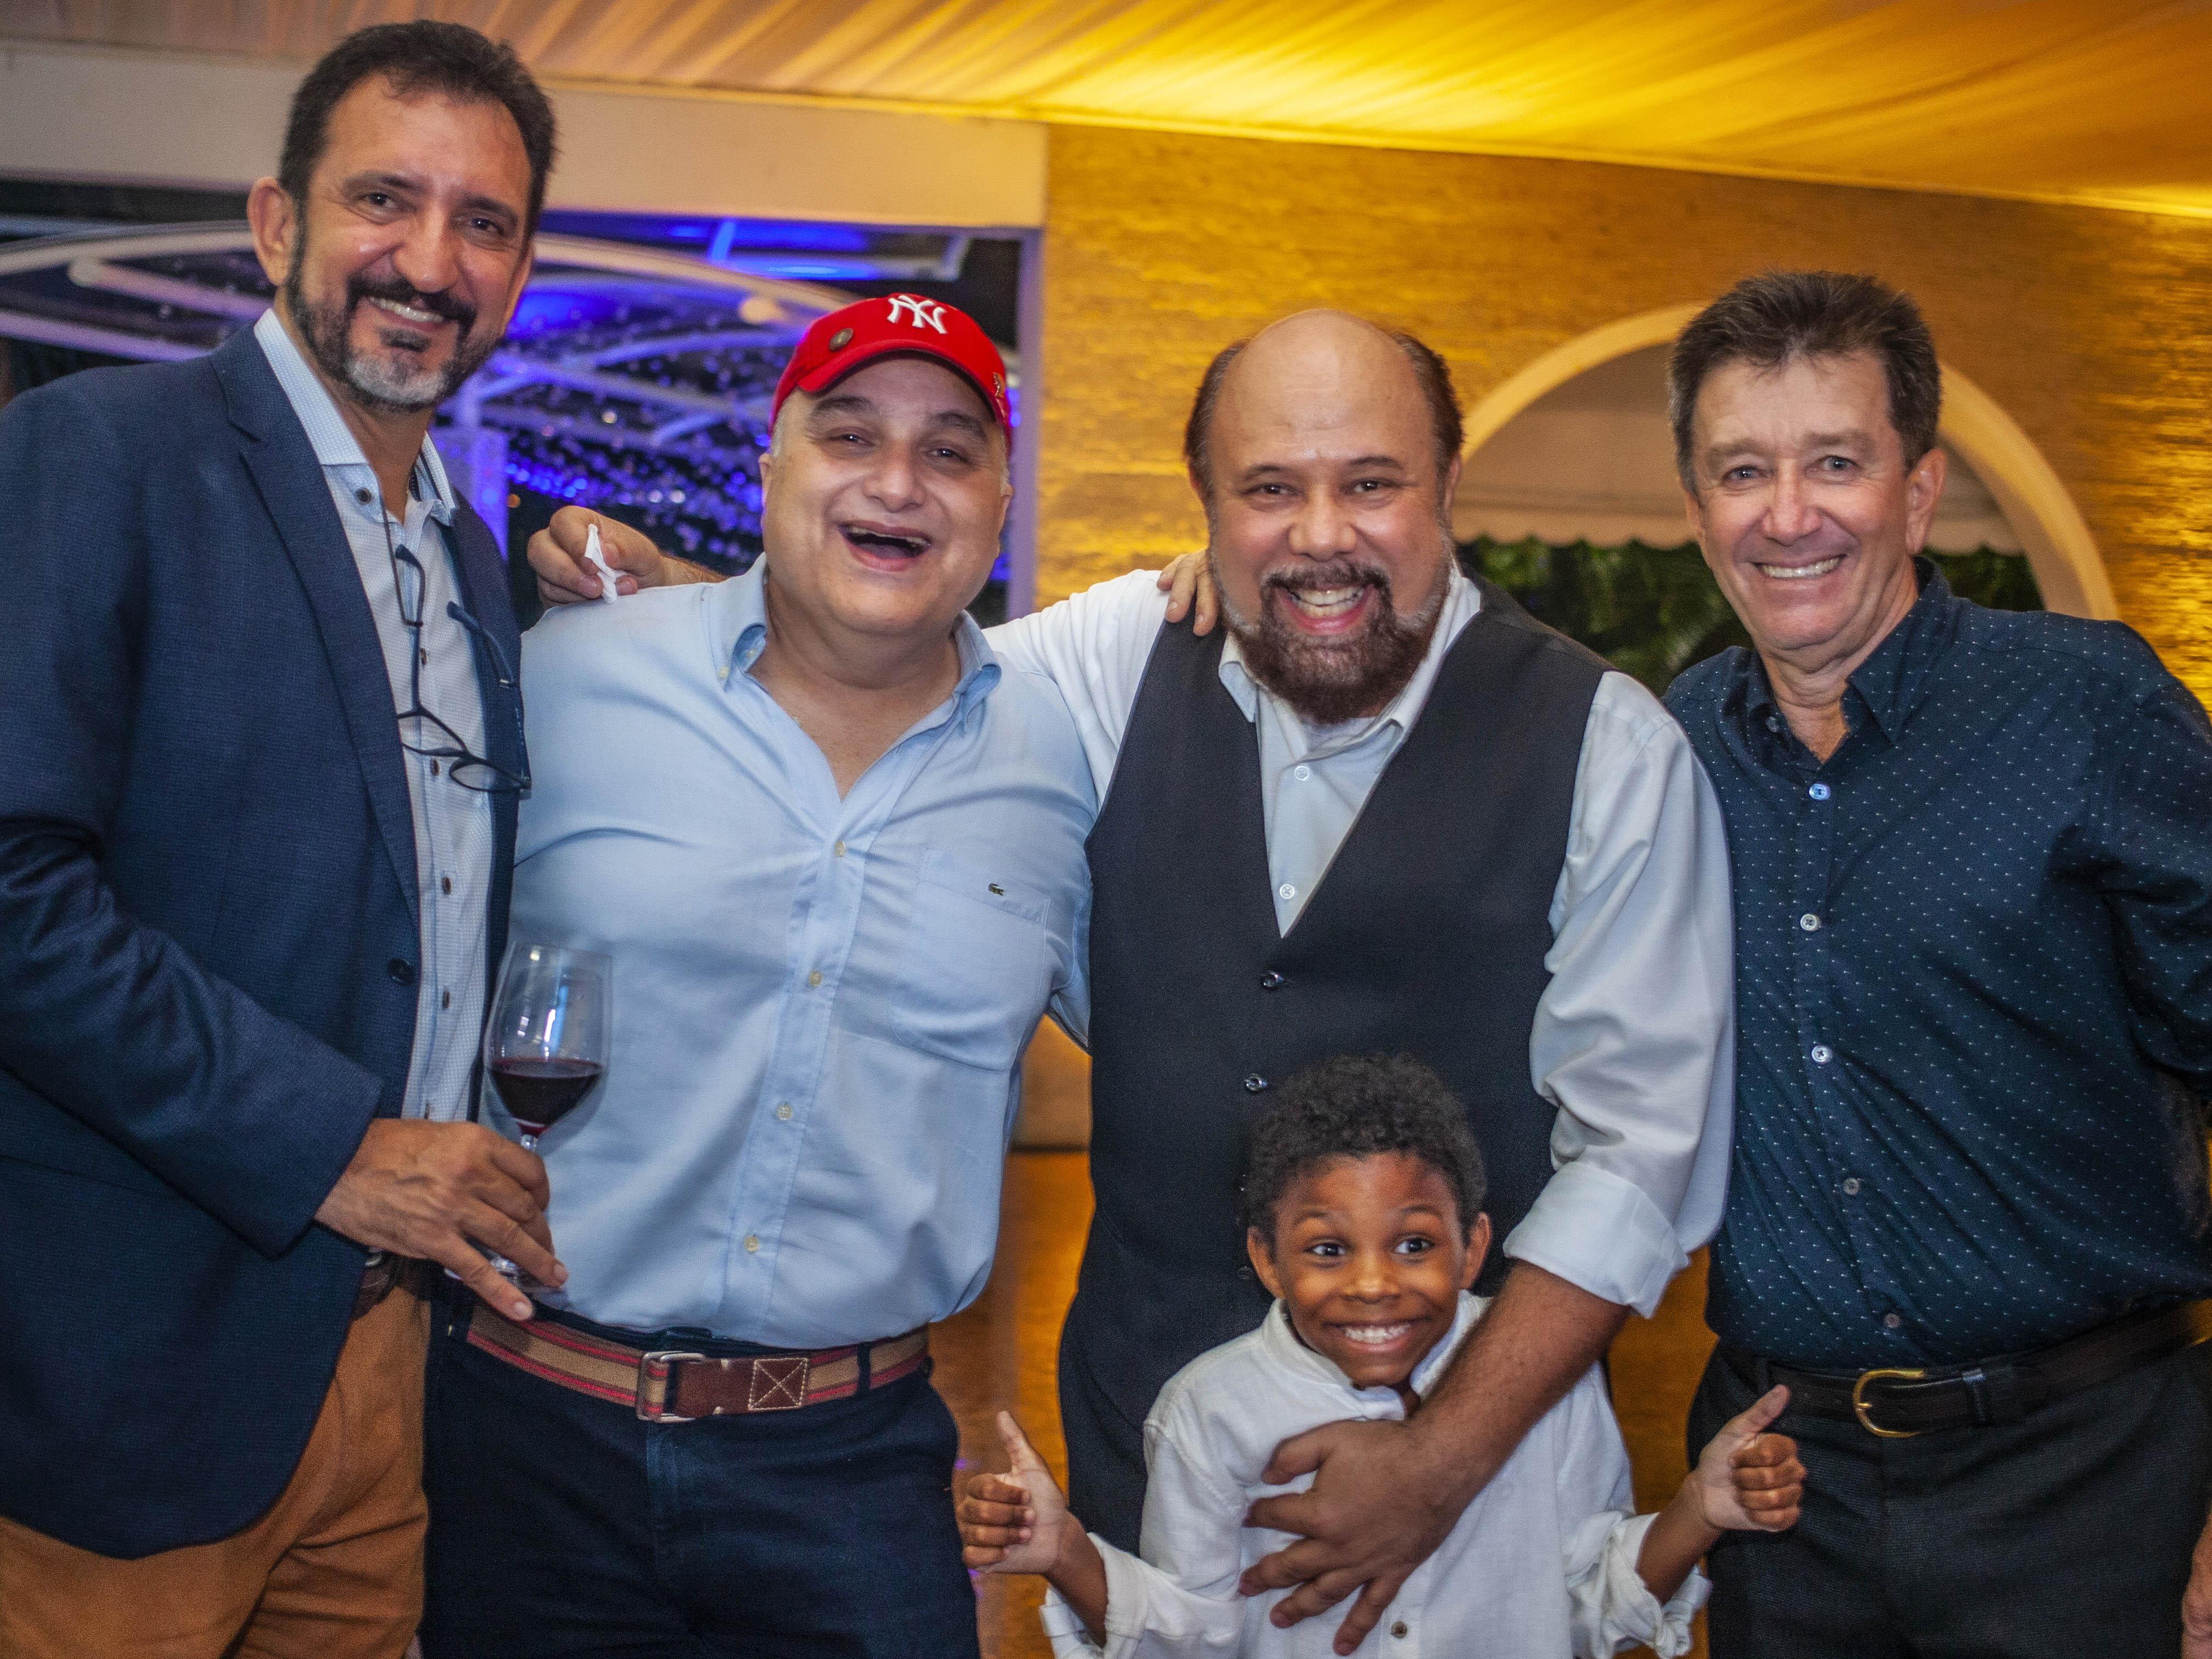 Antelmo Sasso Fim, Licio Bruno, Ramon, Etore Cavalieri e o pequeno Benjamin Bruno. Fotos: Rodger Savaris